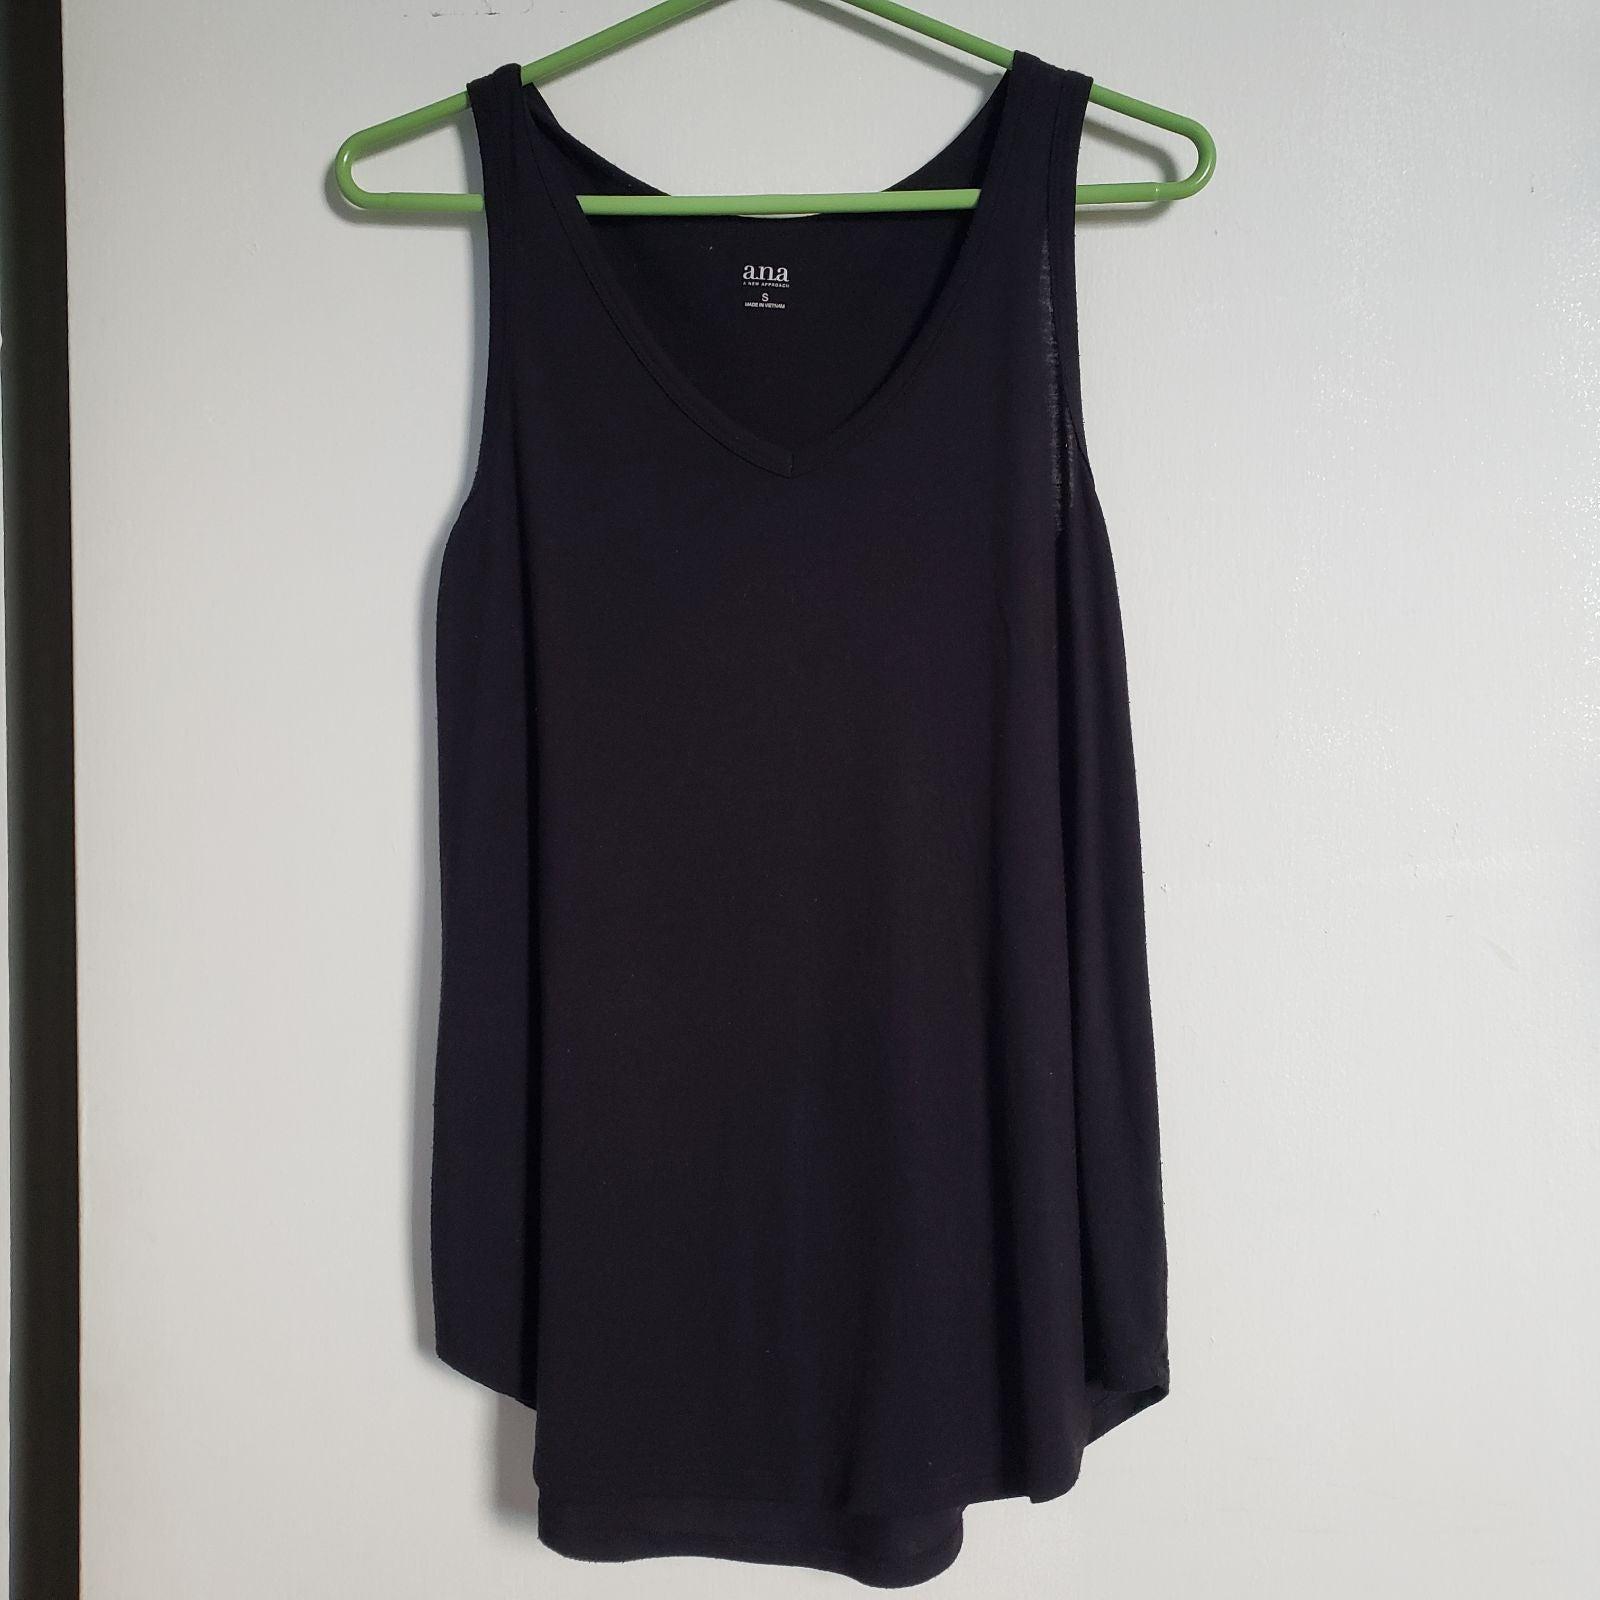 Ana black tank top blouse, S